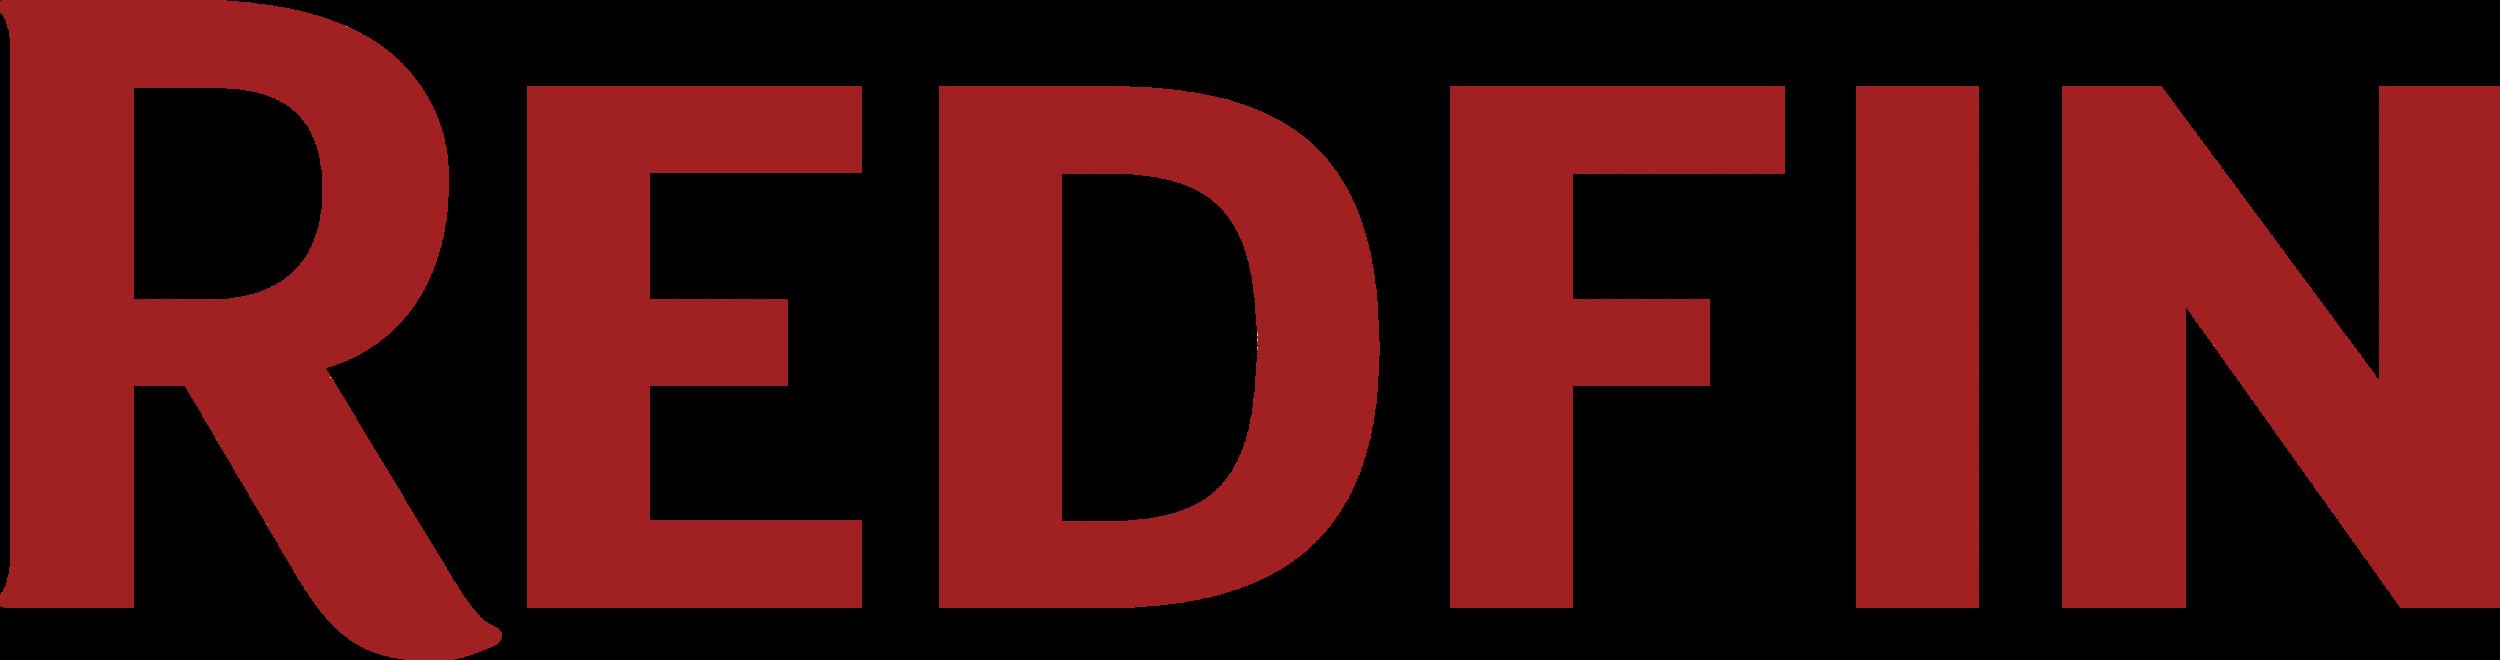 Redfin-Logo-Web-4091x1080.png